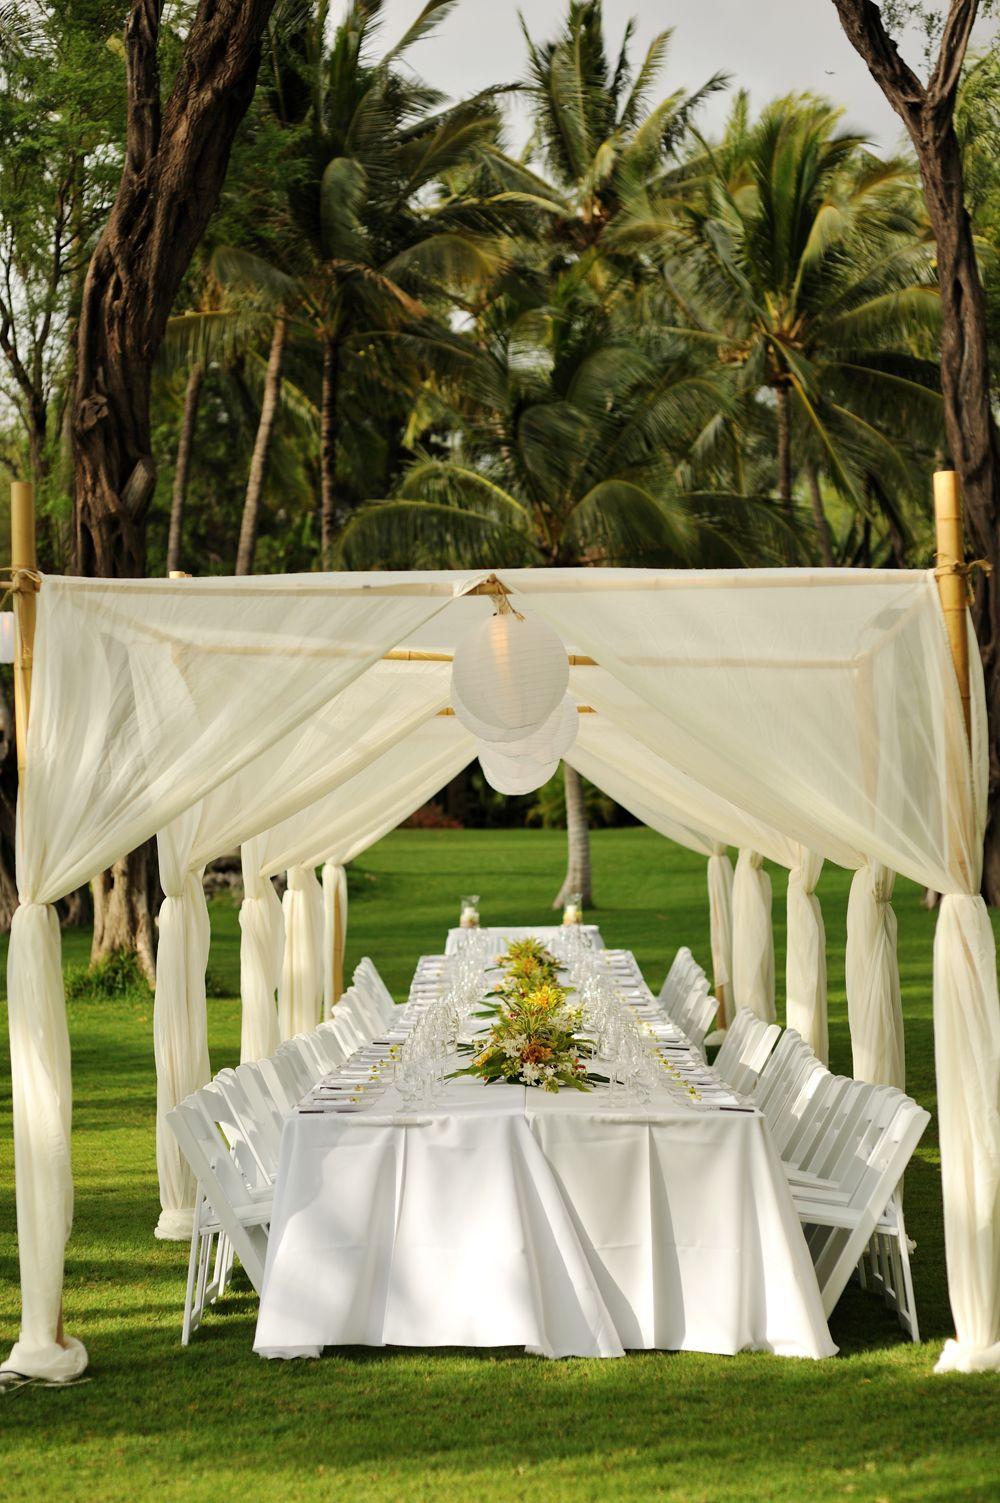 Bamboo Dining Canopy With White Lanterns Set Over A Grand Dining Table White Lanterns Lantern Set Maui Weddings